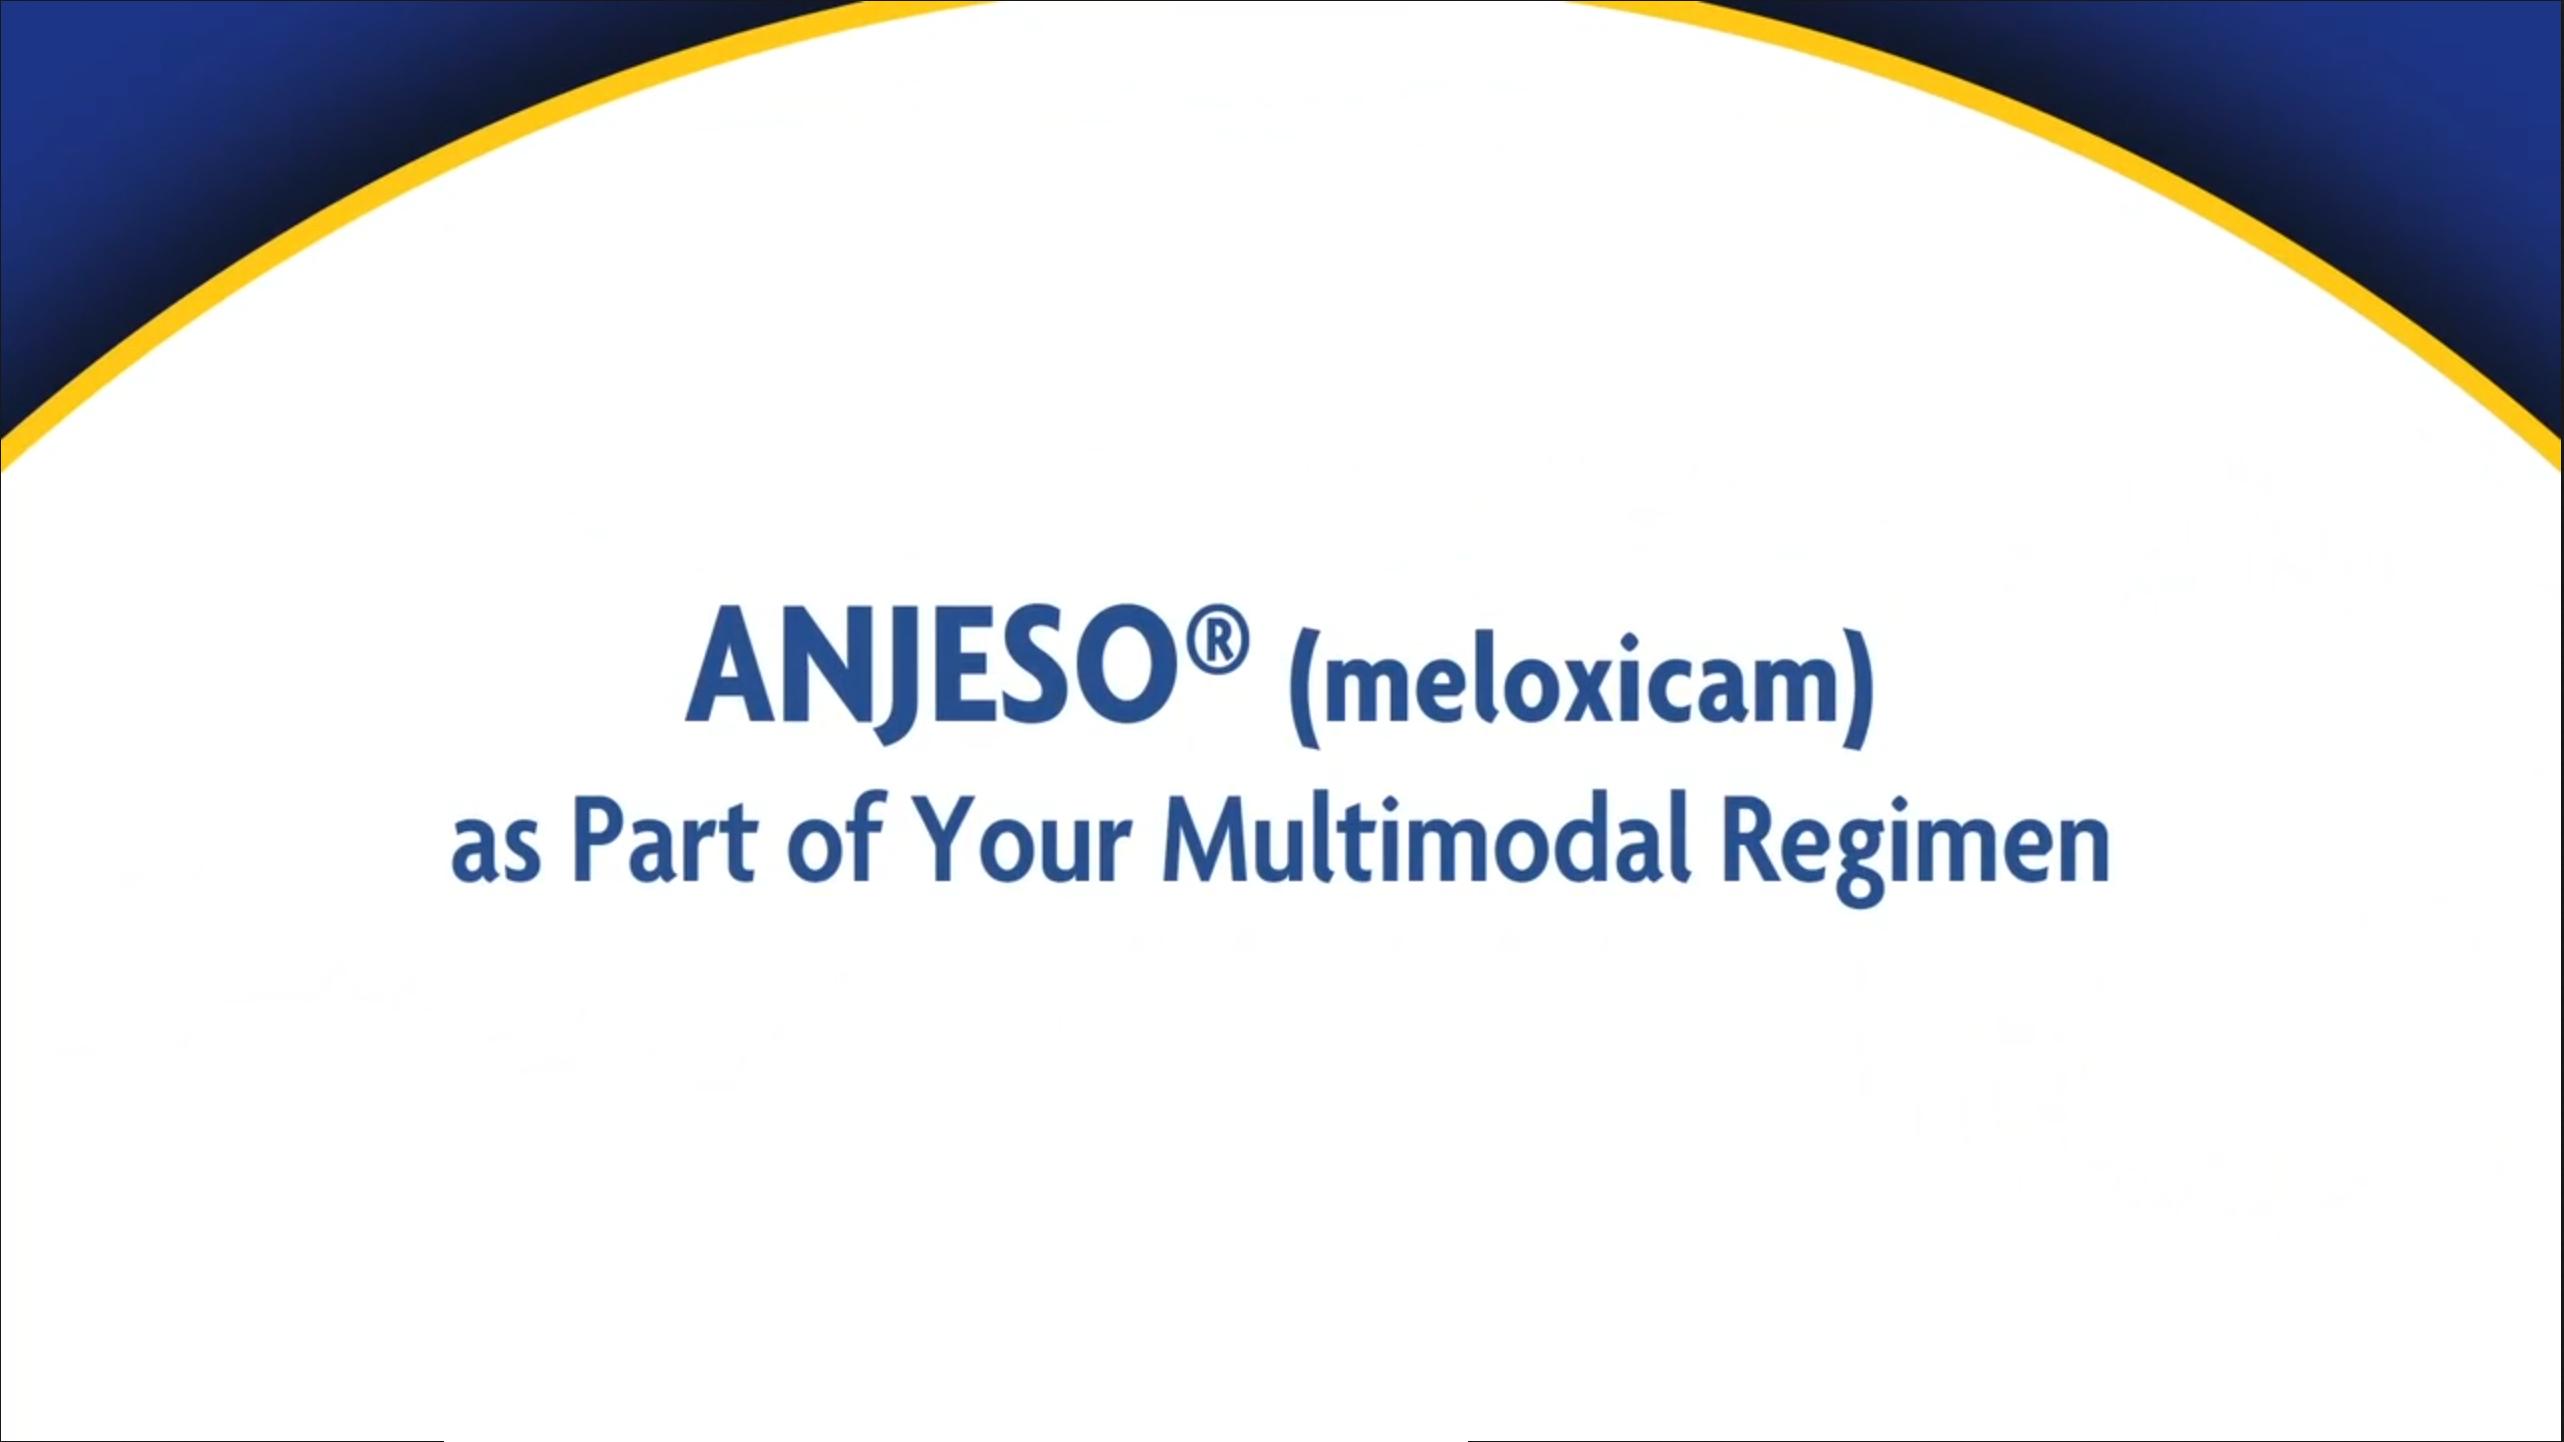 ANJESO as Part of Your Multimodal Regimen Video thumbnail